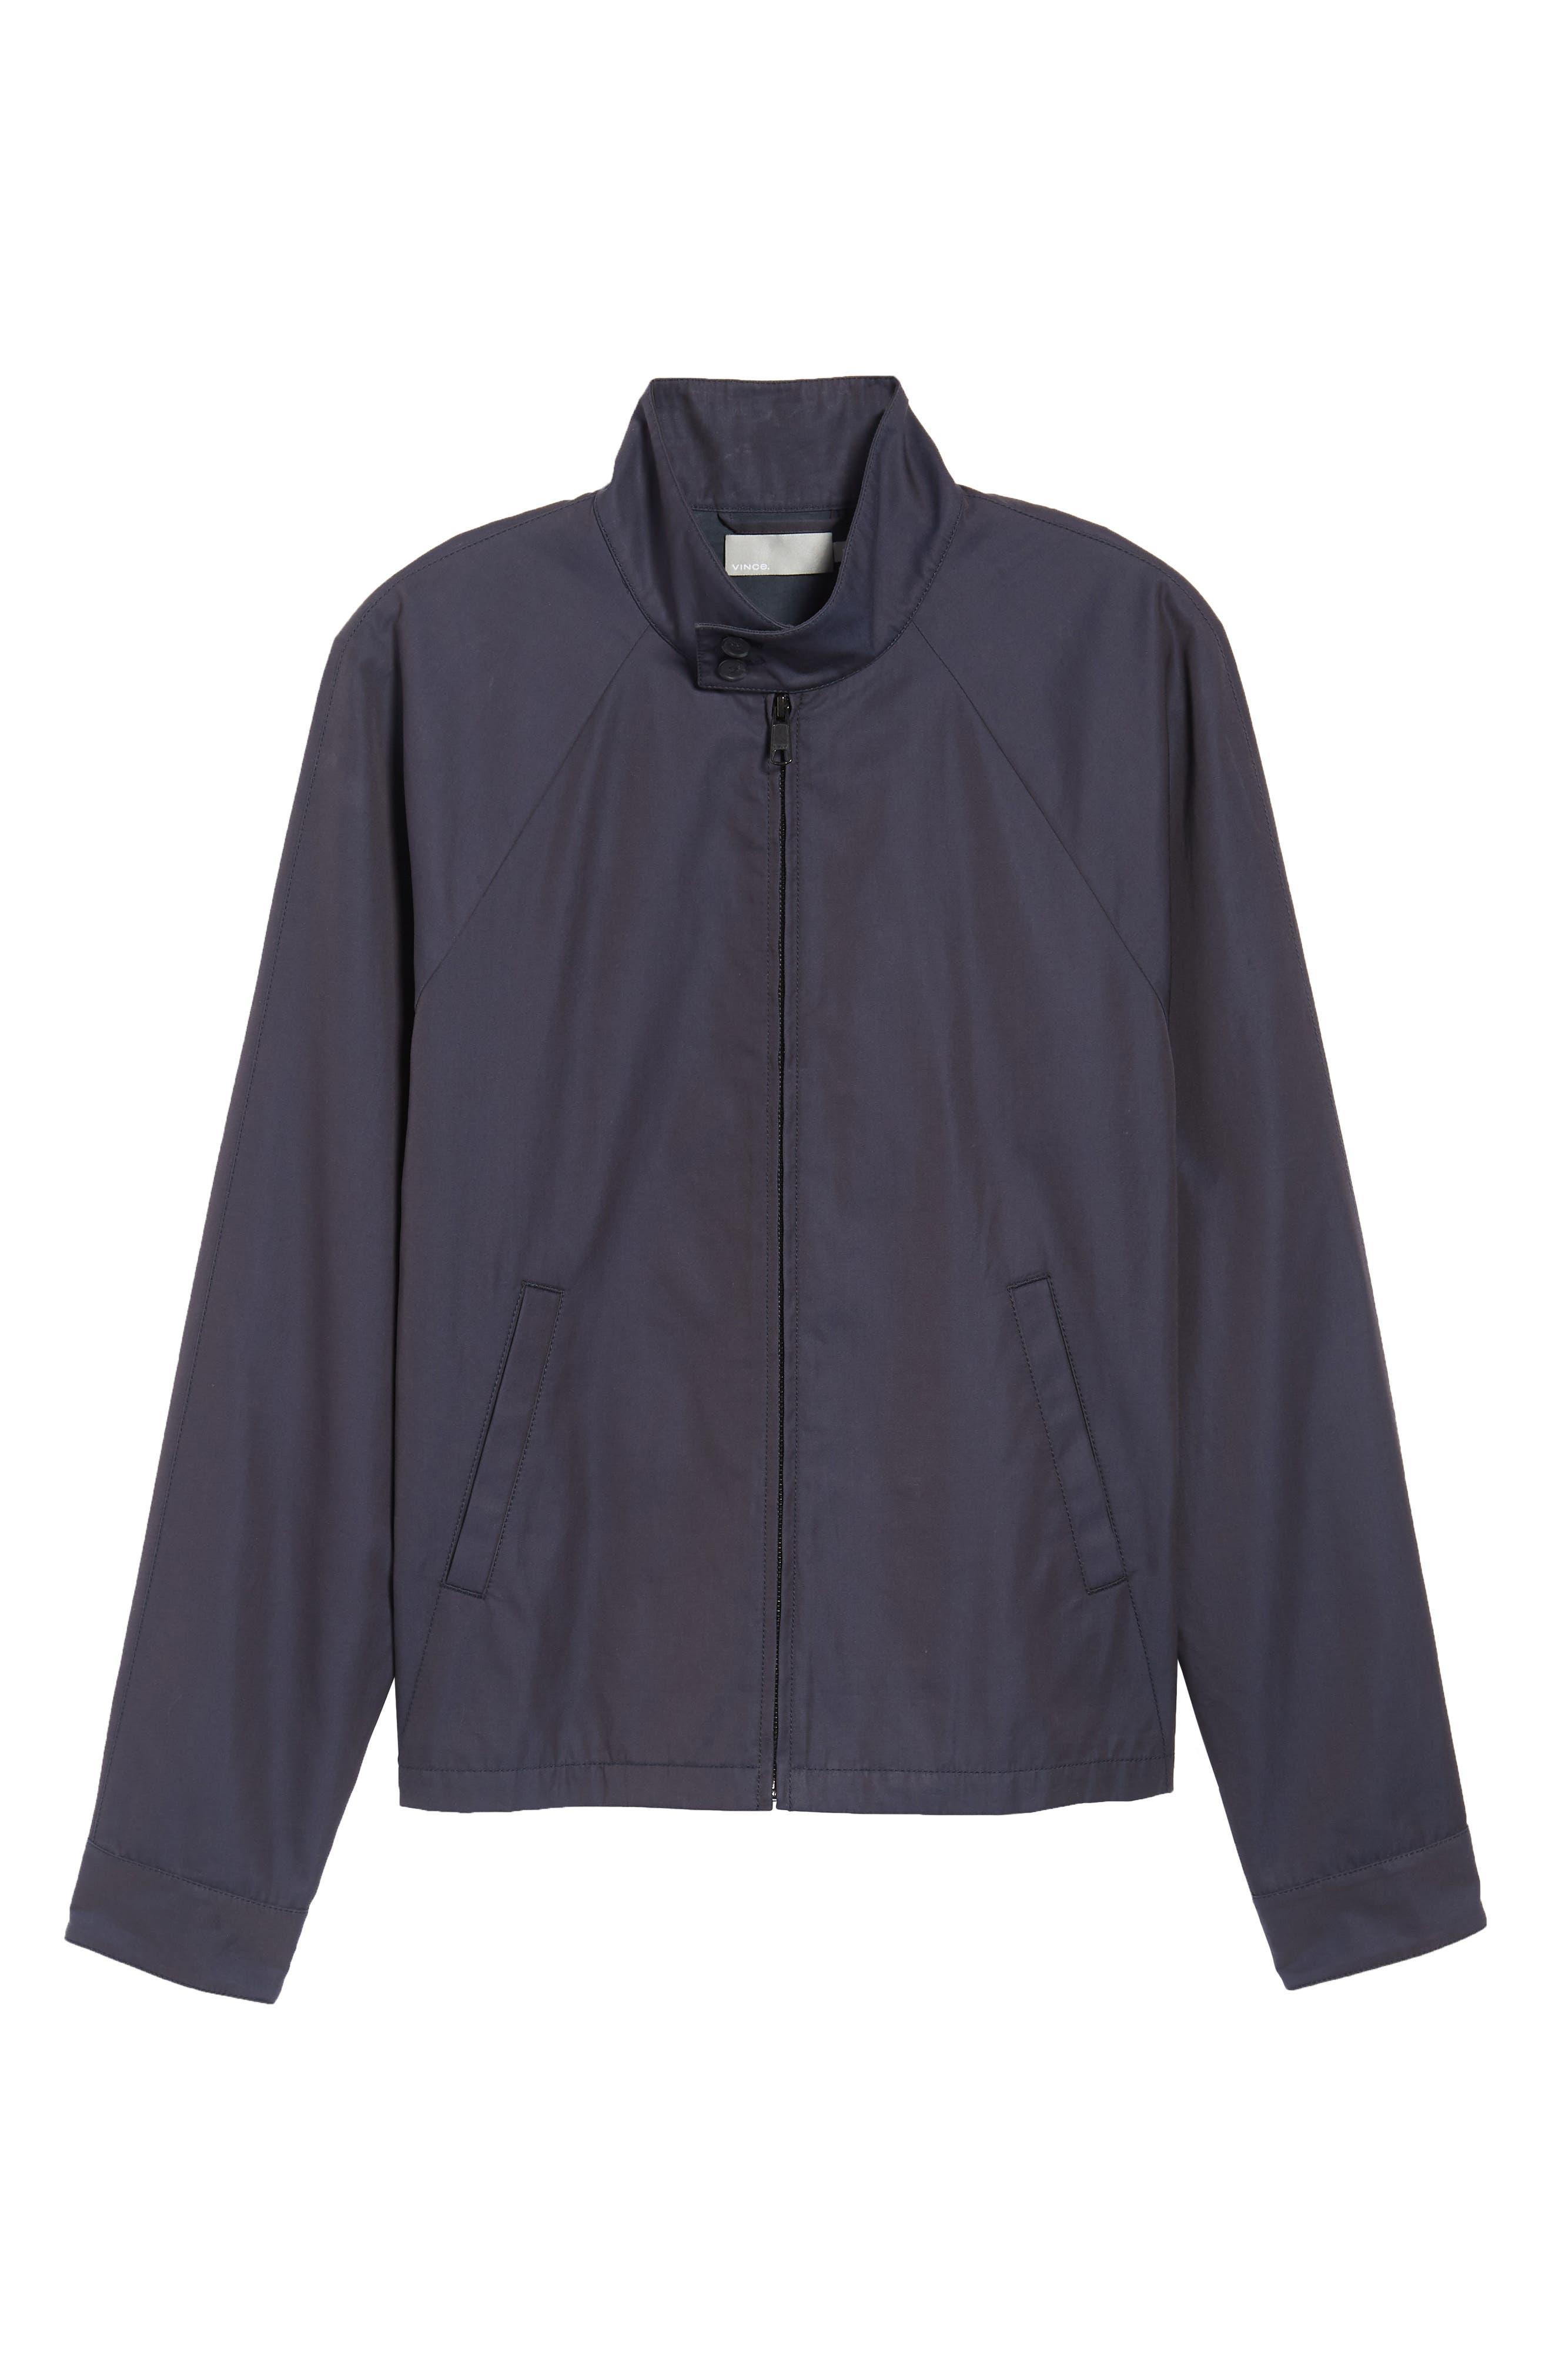 Regular Fit Jacket,                             Alternate thumbnail 5, color,                             NAVY